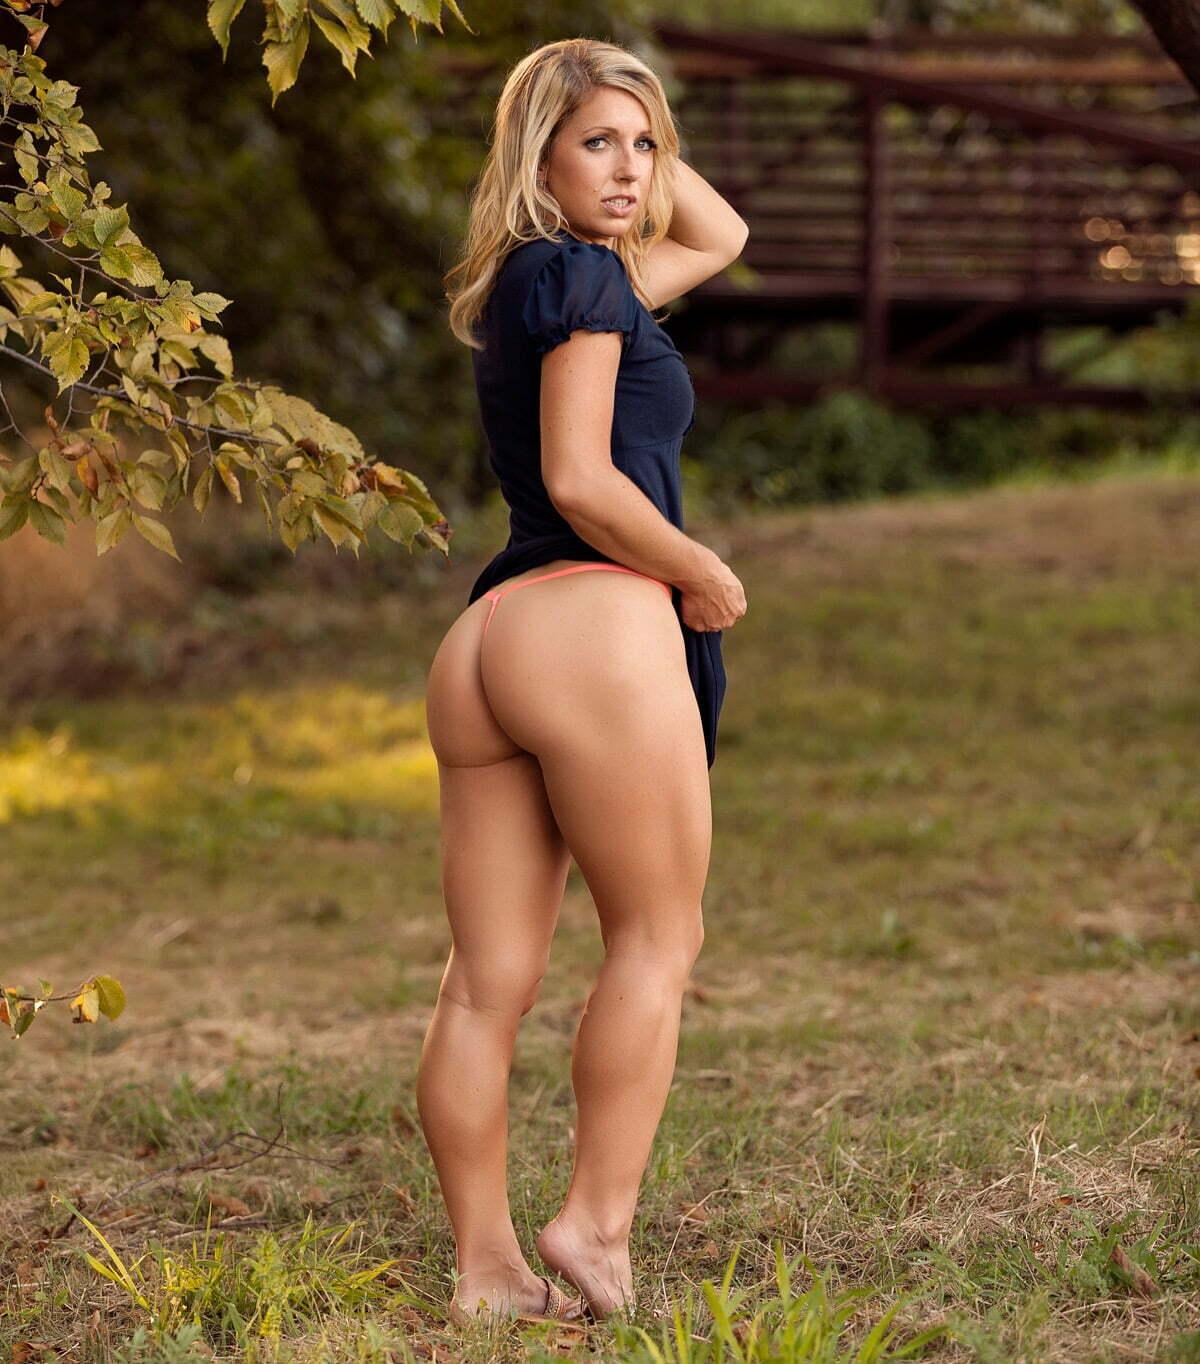 Courtney ann, texas thighs